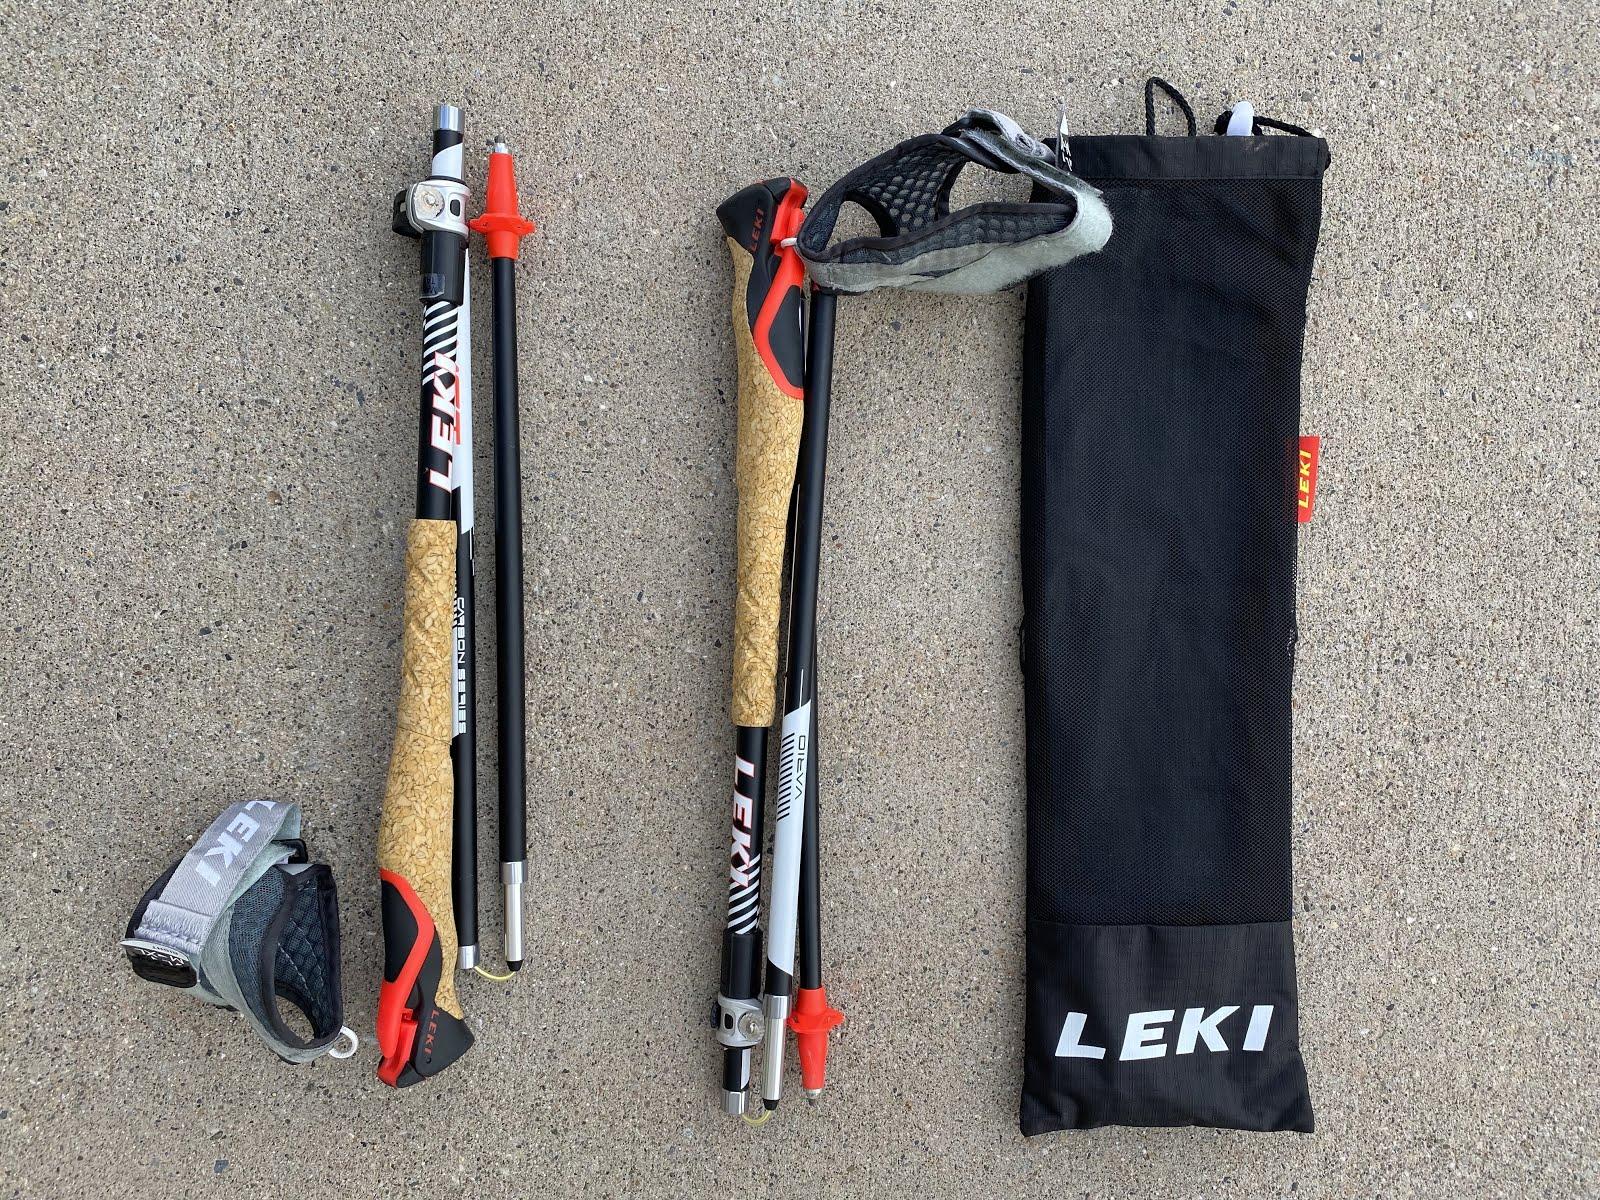 LEKI MCT Vario TA Trekking//Trail Running Poles